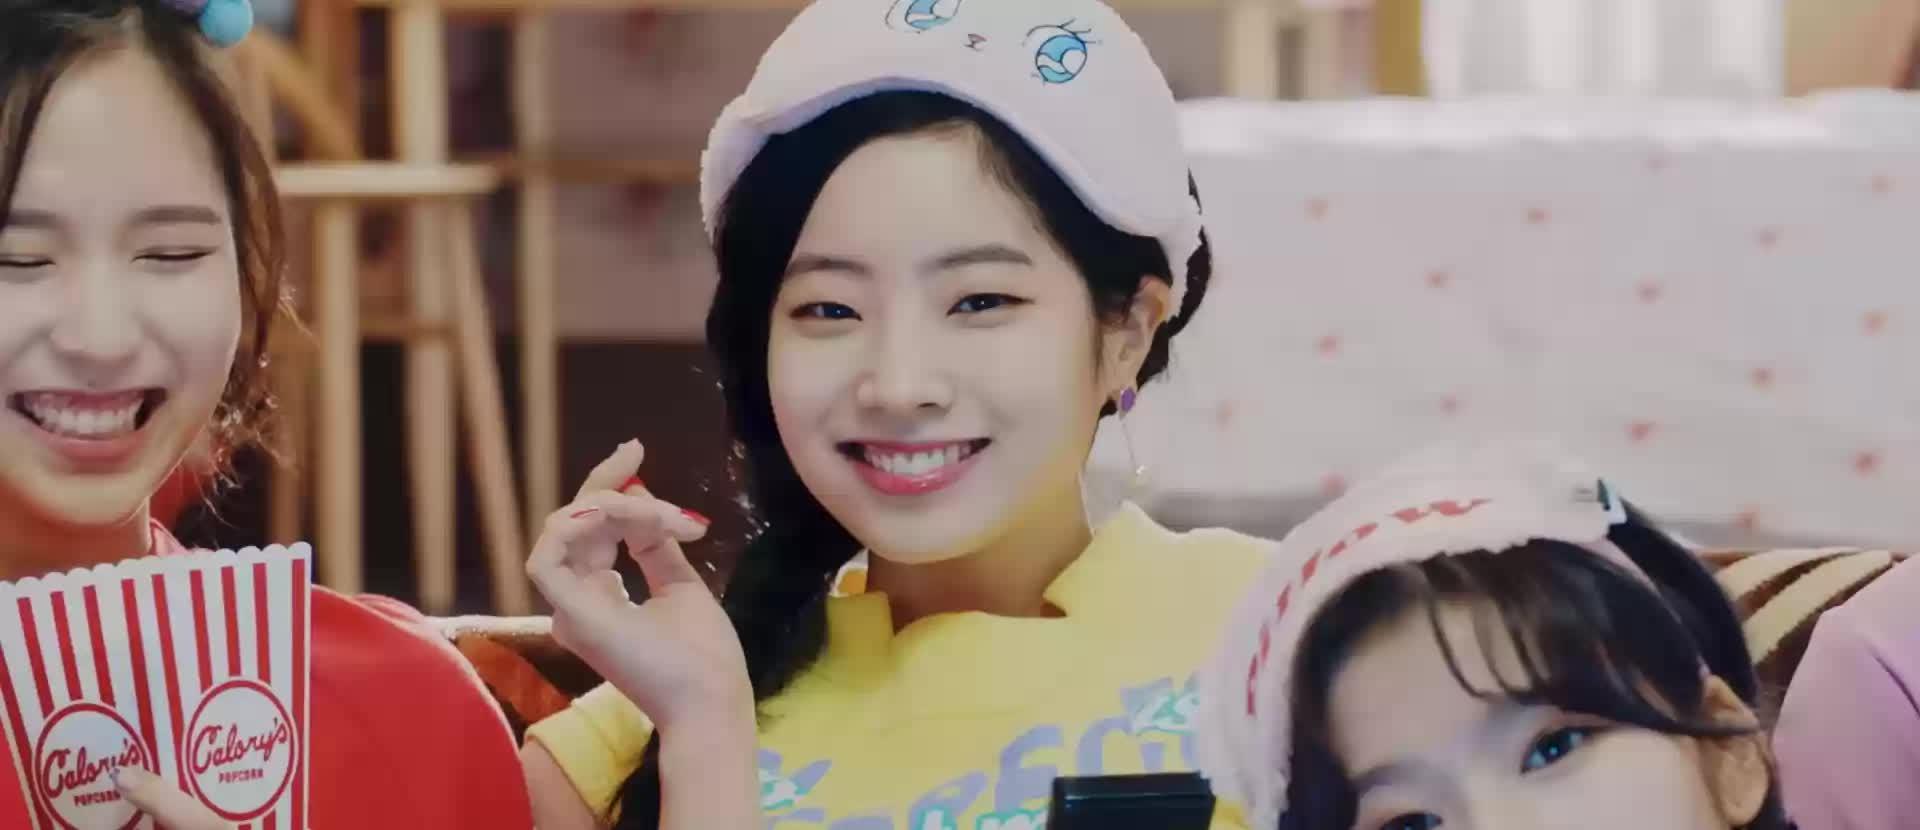 dahyun, kpop, mina, twice, Desktop 04.24.2018 - 17.29.03.04.DVR GIFs